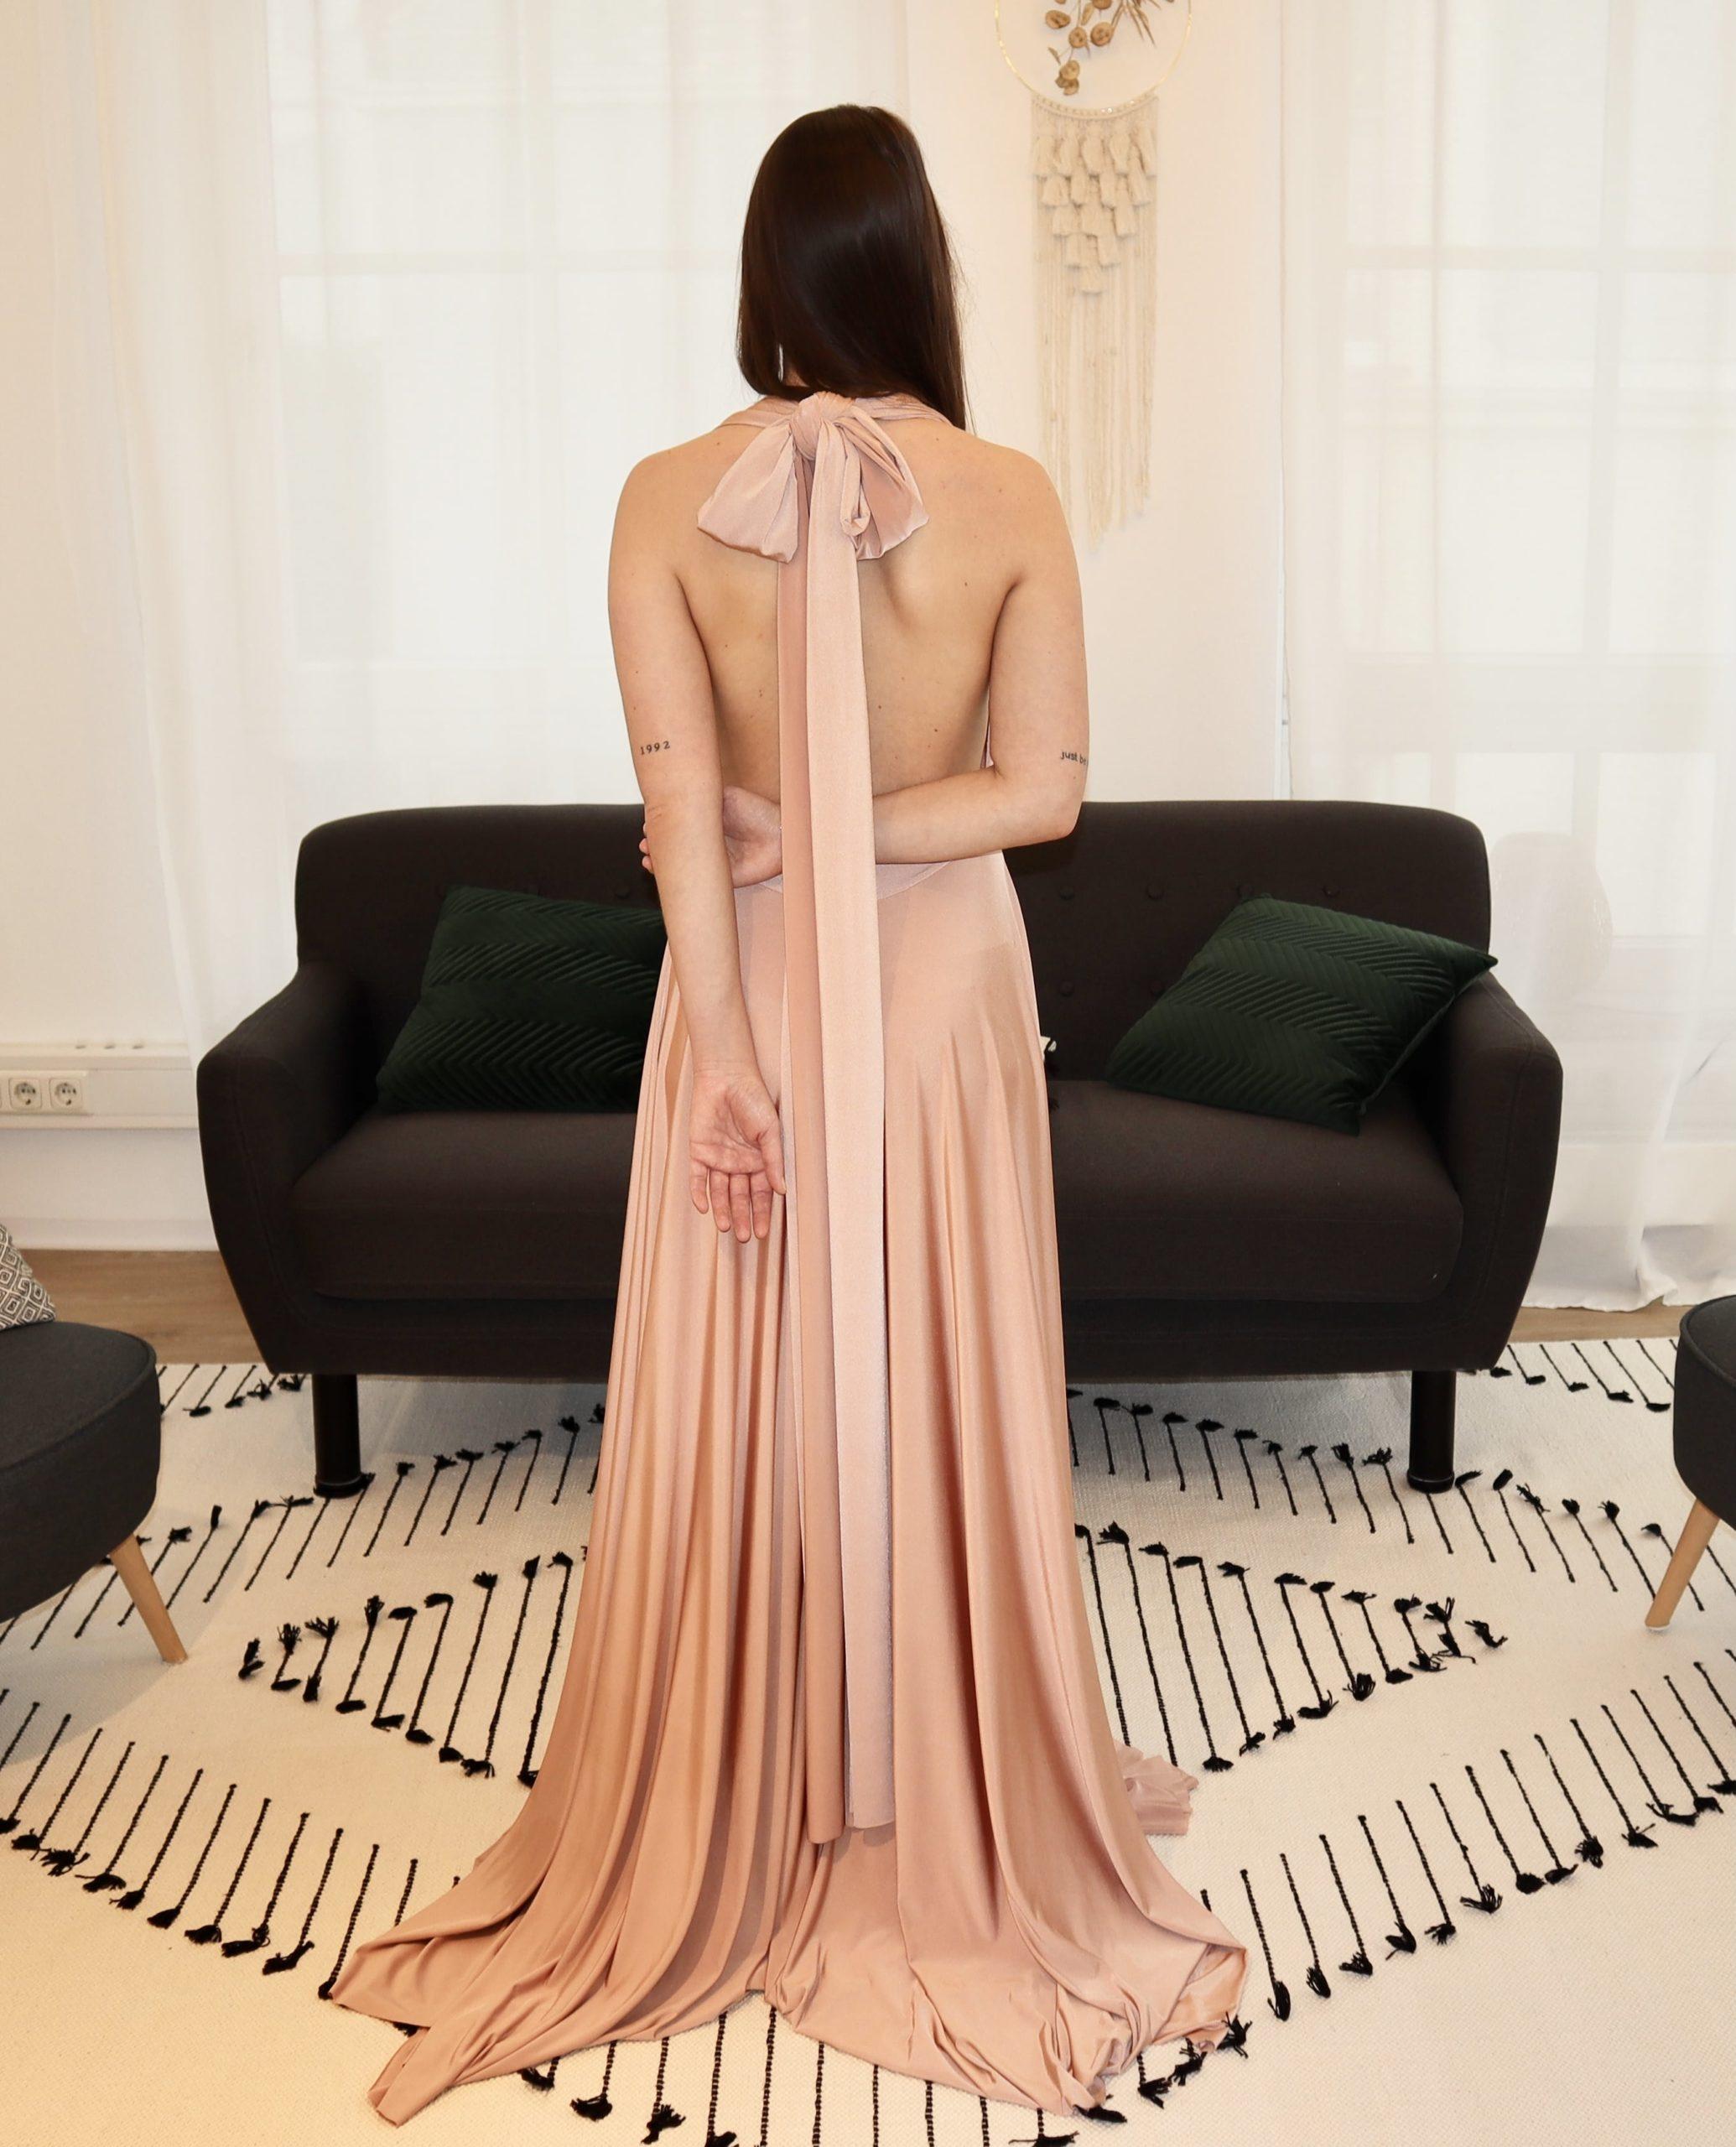 brautatelier ried-brautjungfernkleider-bridesmaids-two birds ny-long dress-rosewood-ruecken-1